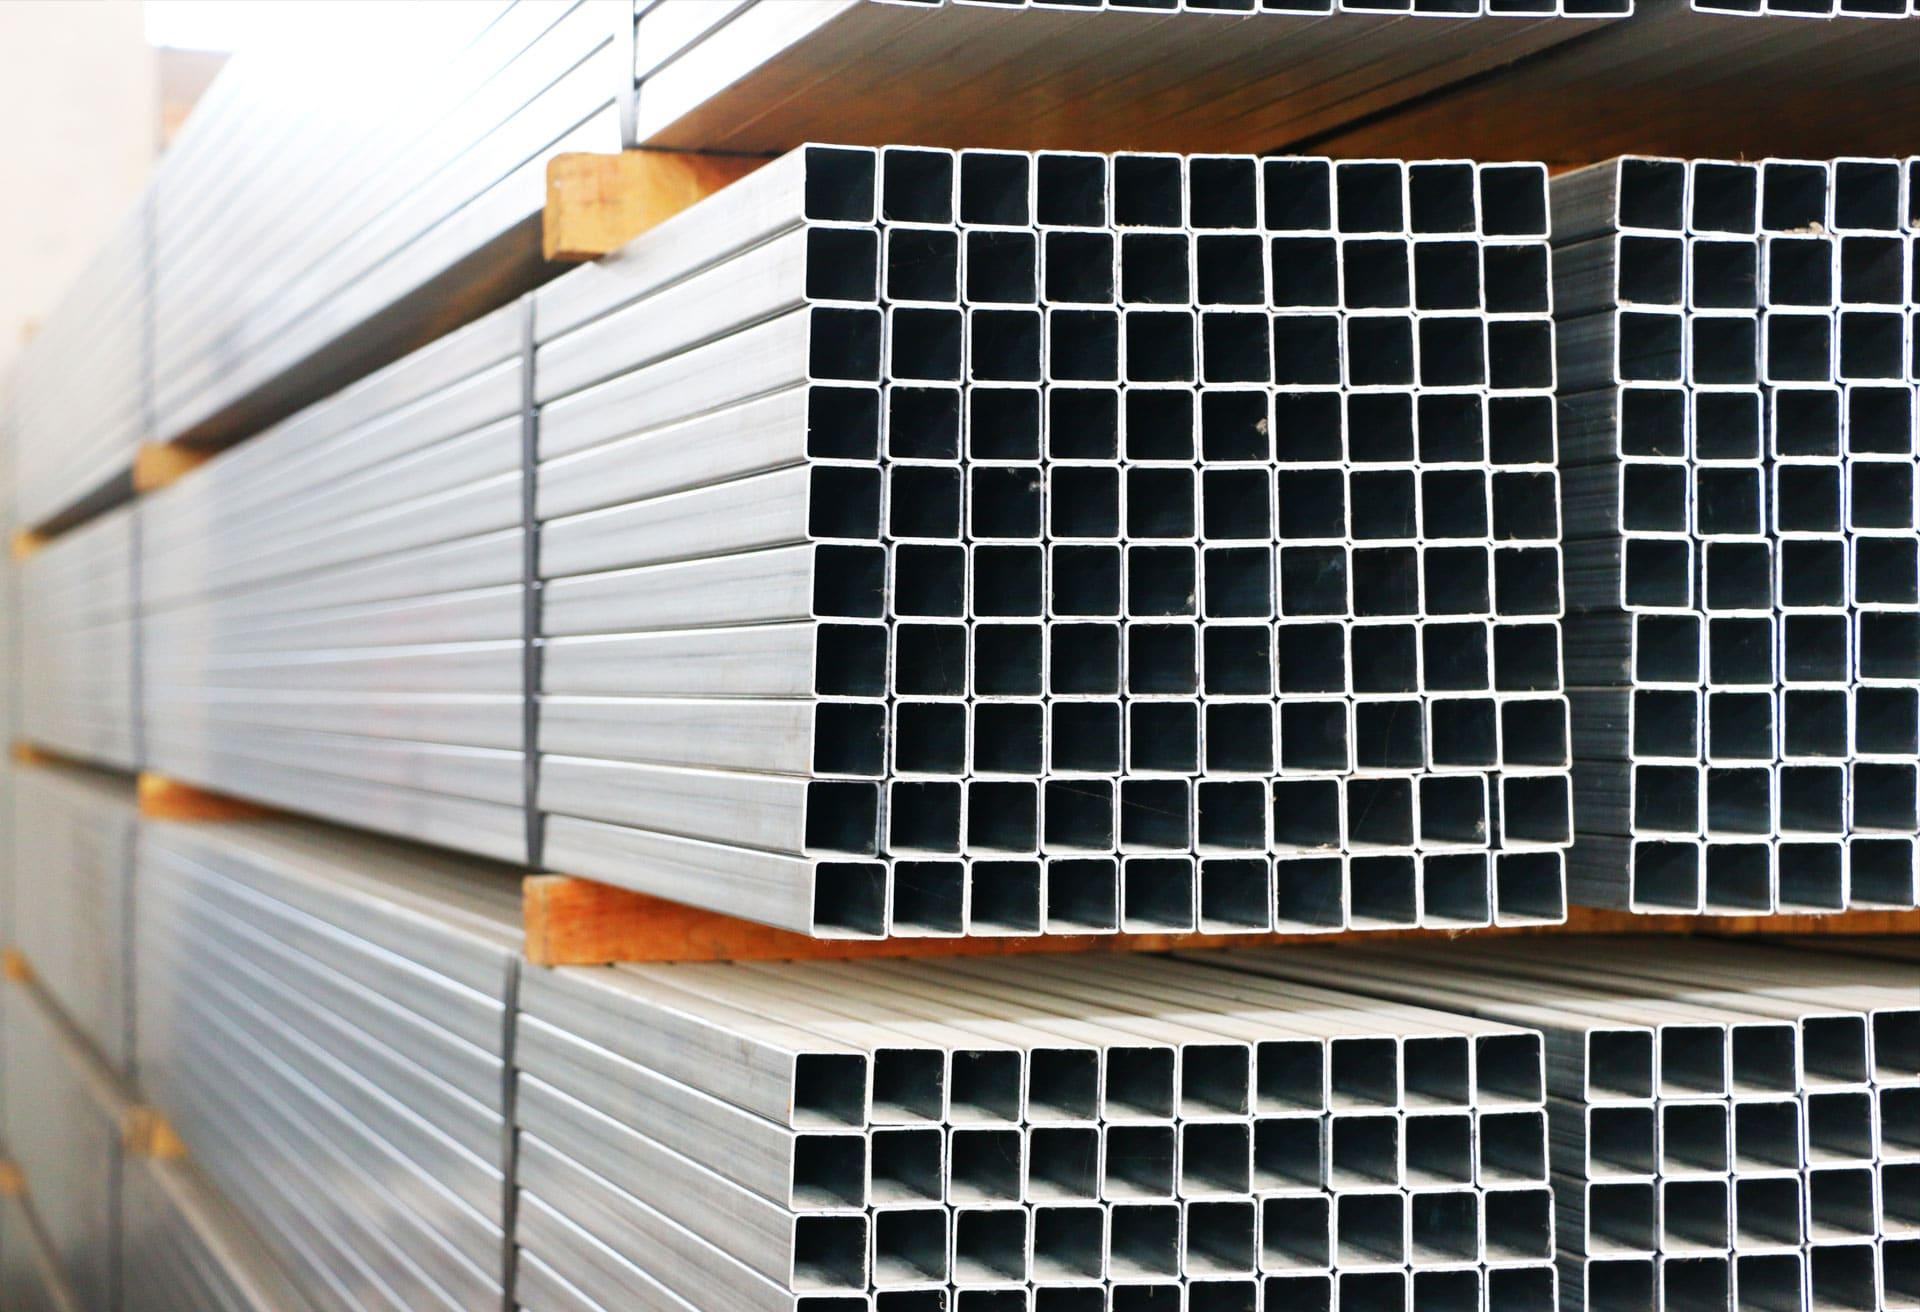 Galvanizli kare profil, galvanizli demir profil, galvanizli kutu profil, galvanizli paslanmaz çelik profil, çelik kare profil, içi boş çelik profil, kutu profil fiyatları